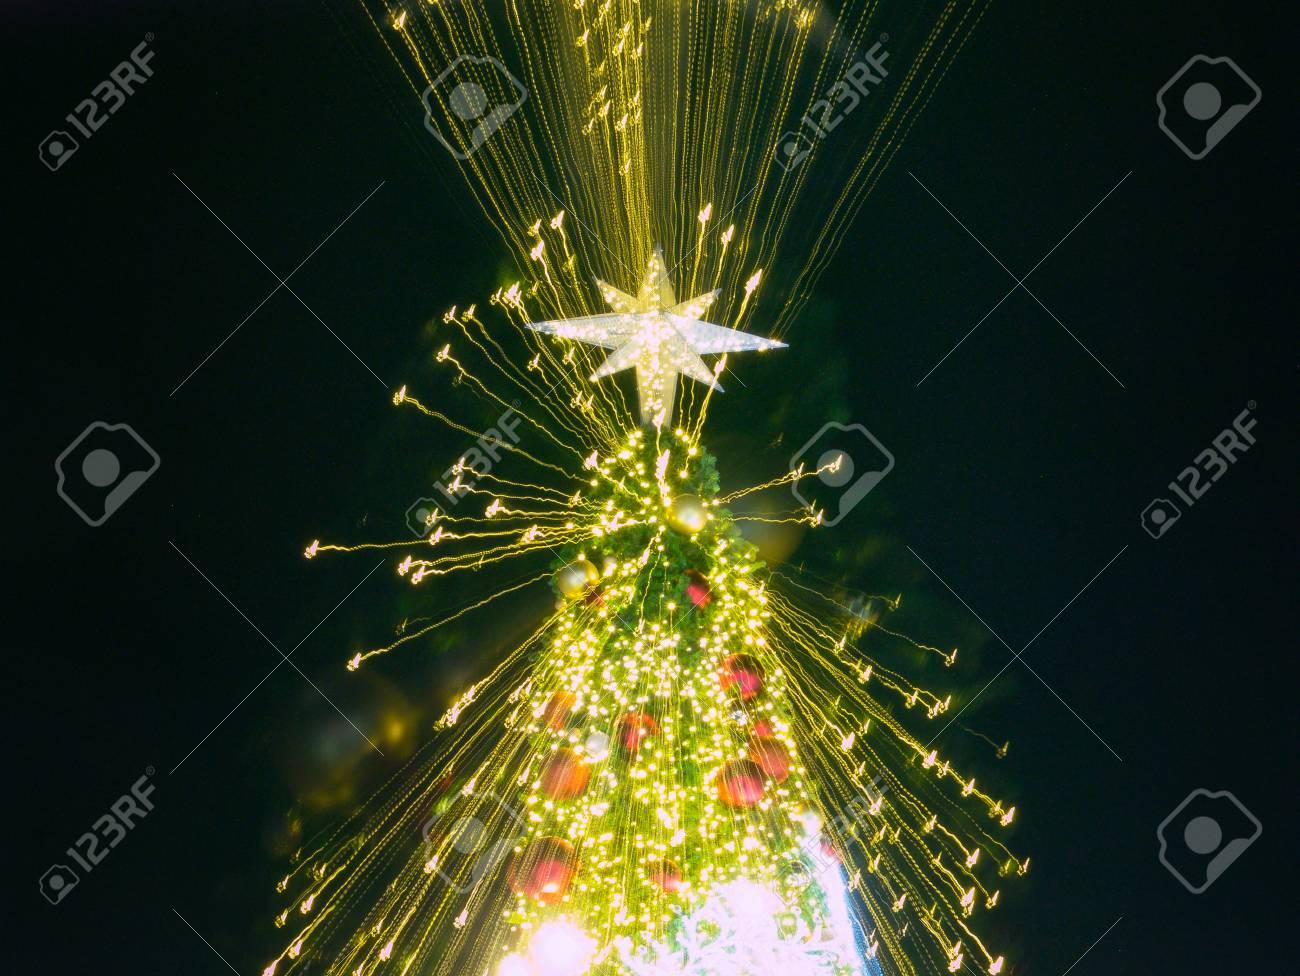 Light Of Christmas.Zoom Burst Light Of Artificial Pine Christmas Tree With Star